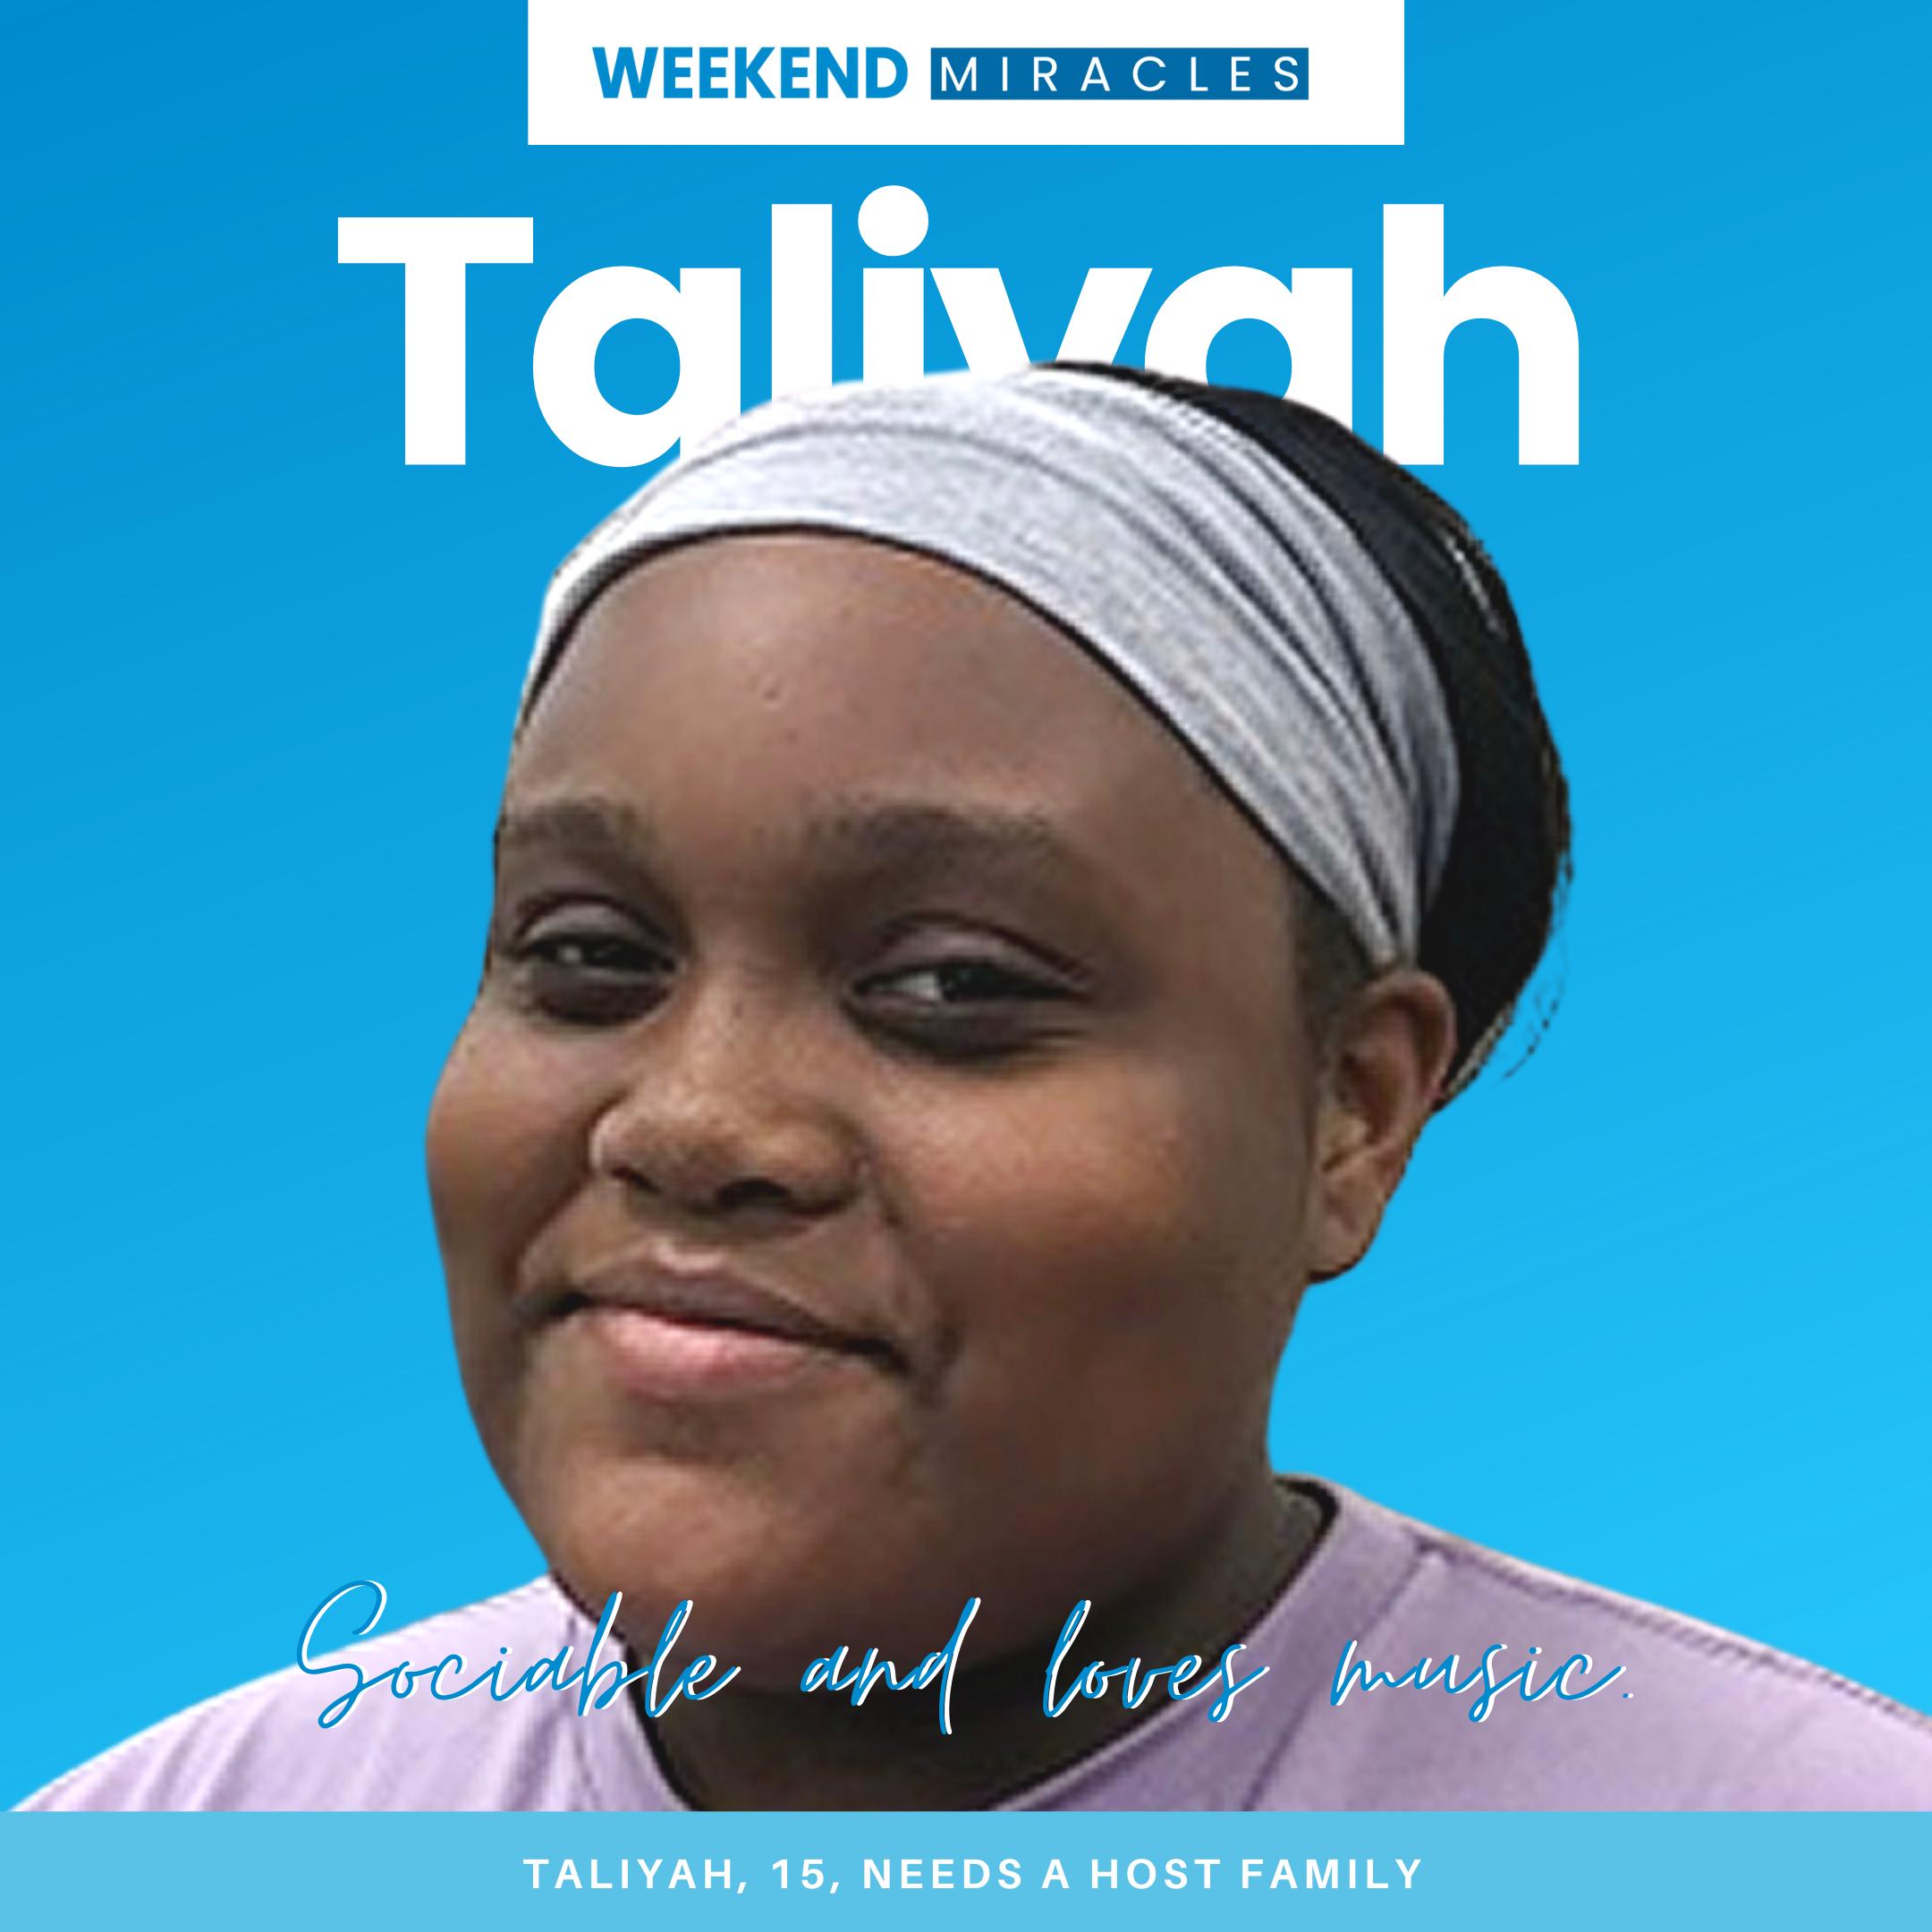 Meet Taliyah